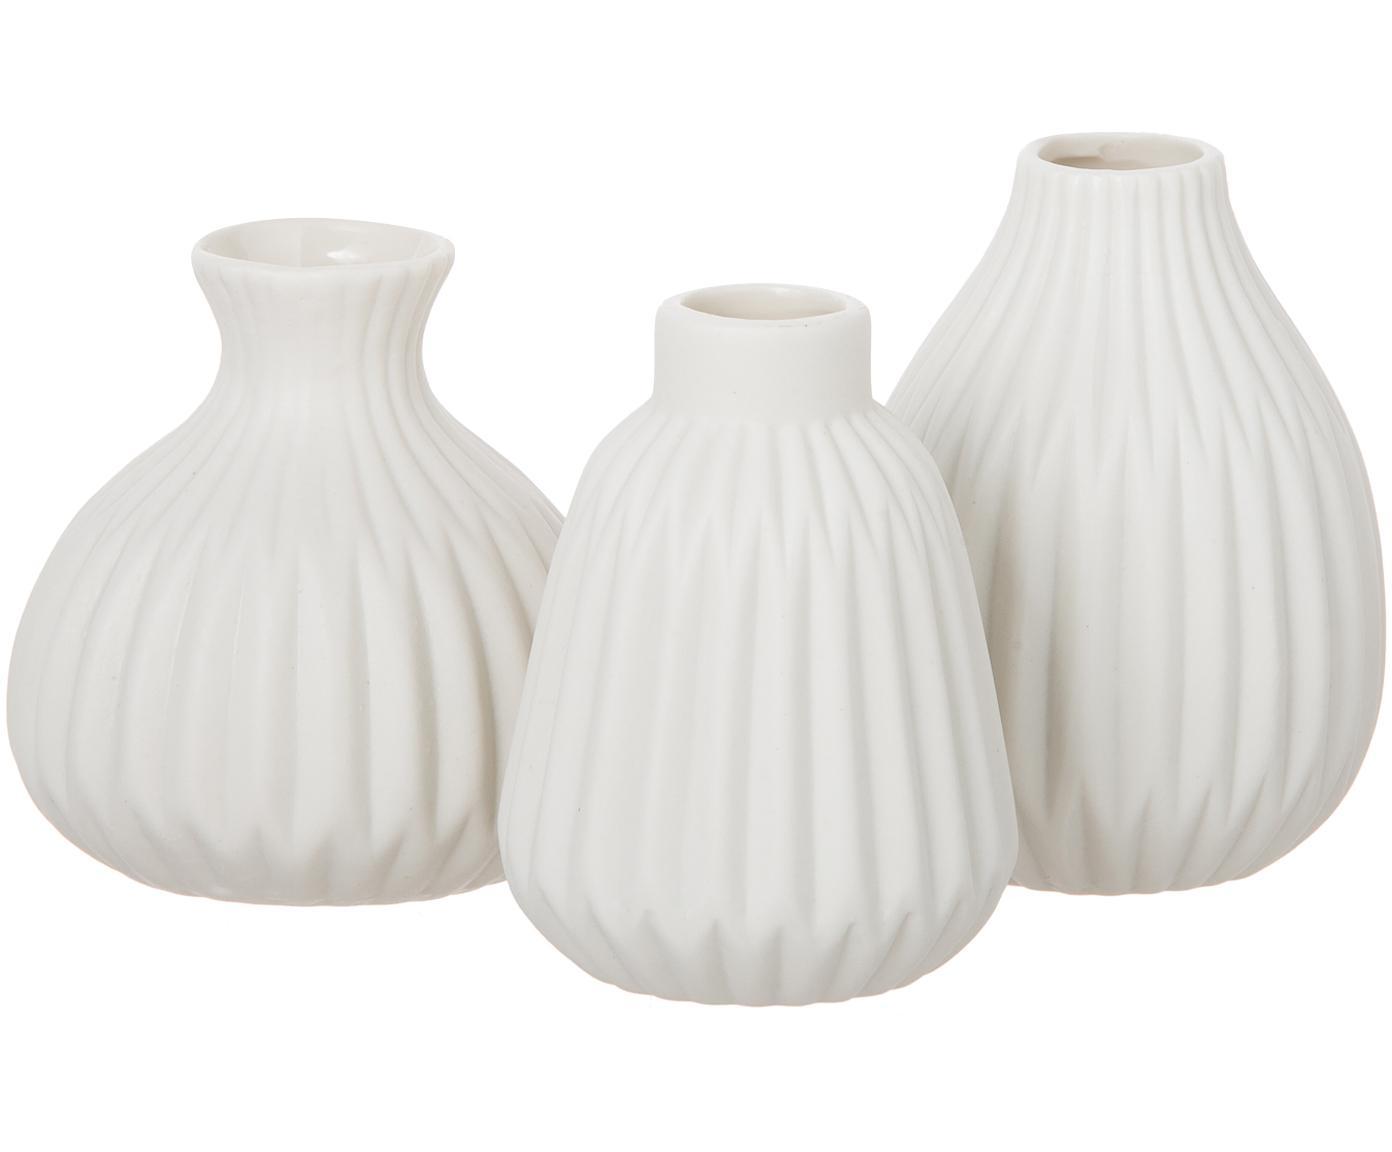 Set 3 vasi in porcellana Esko, Porcellana, Bianco, Diverse dimensioni